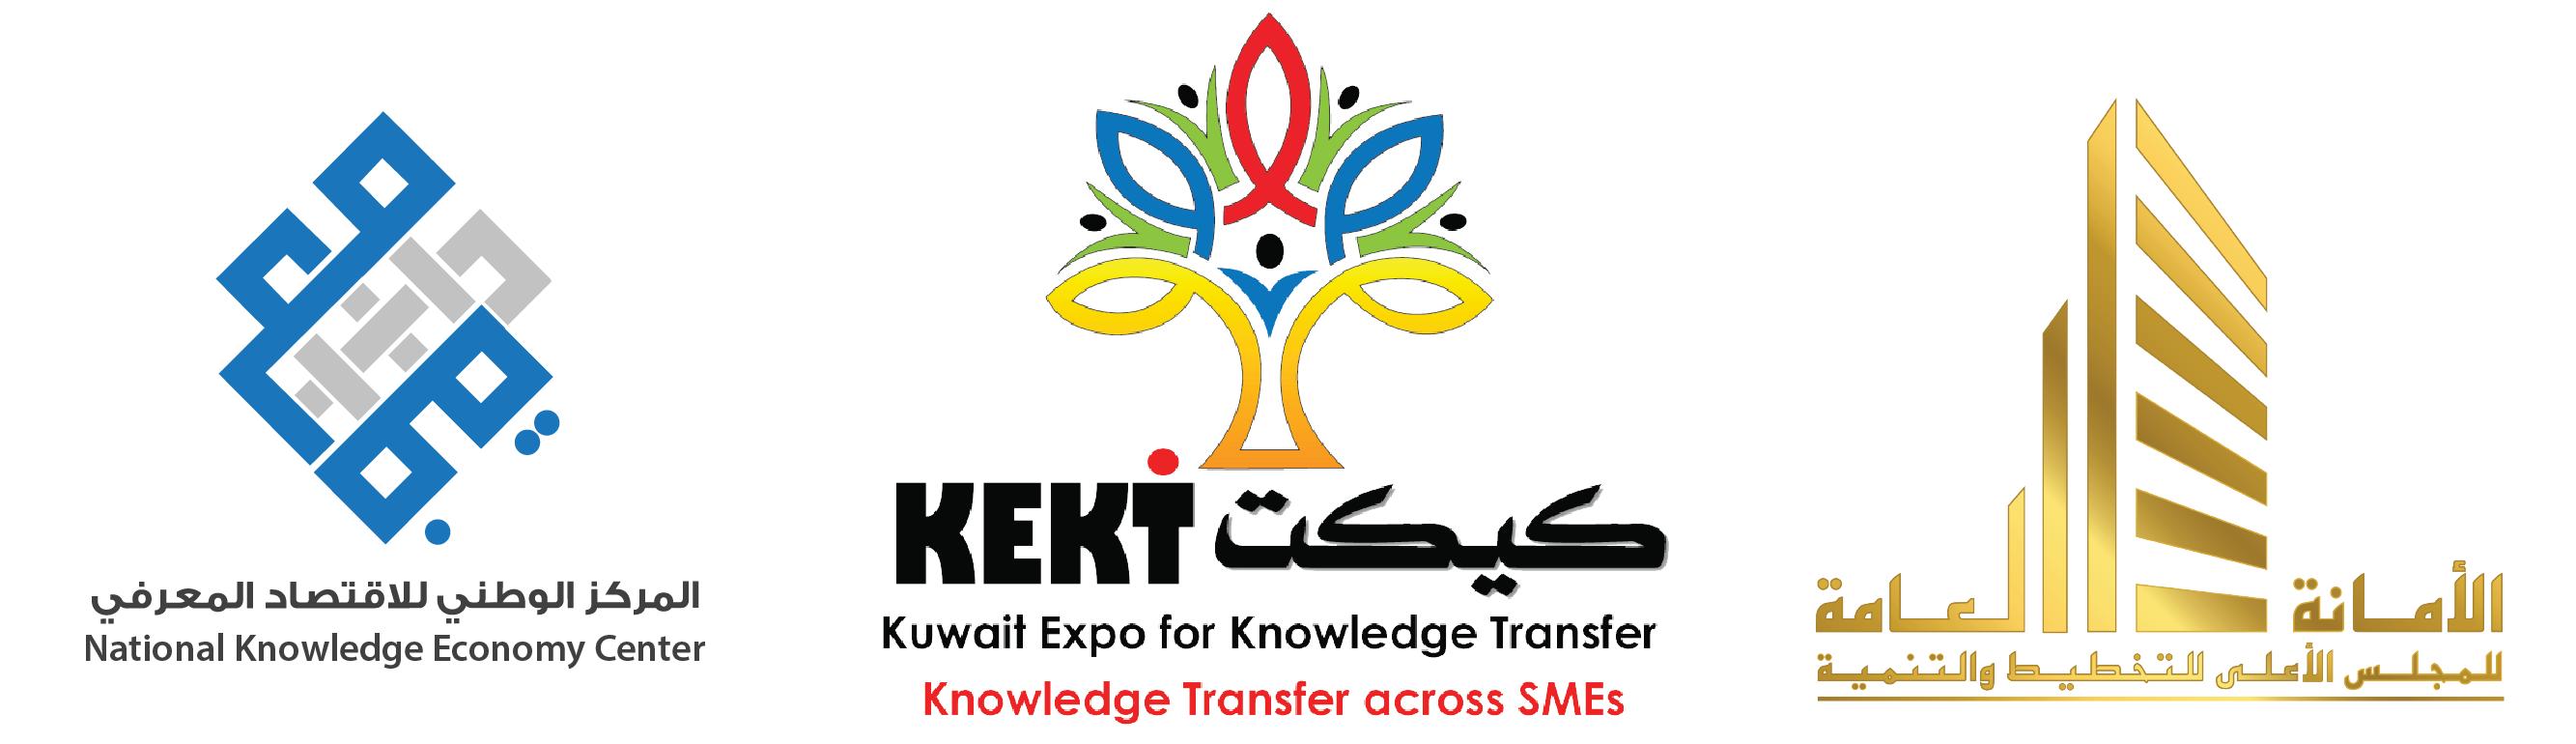 2016 Leadership Insight Series Kuwait logos 2-01